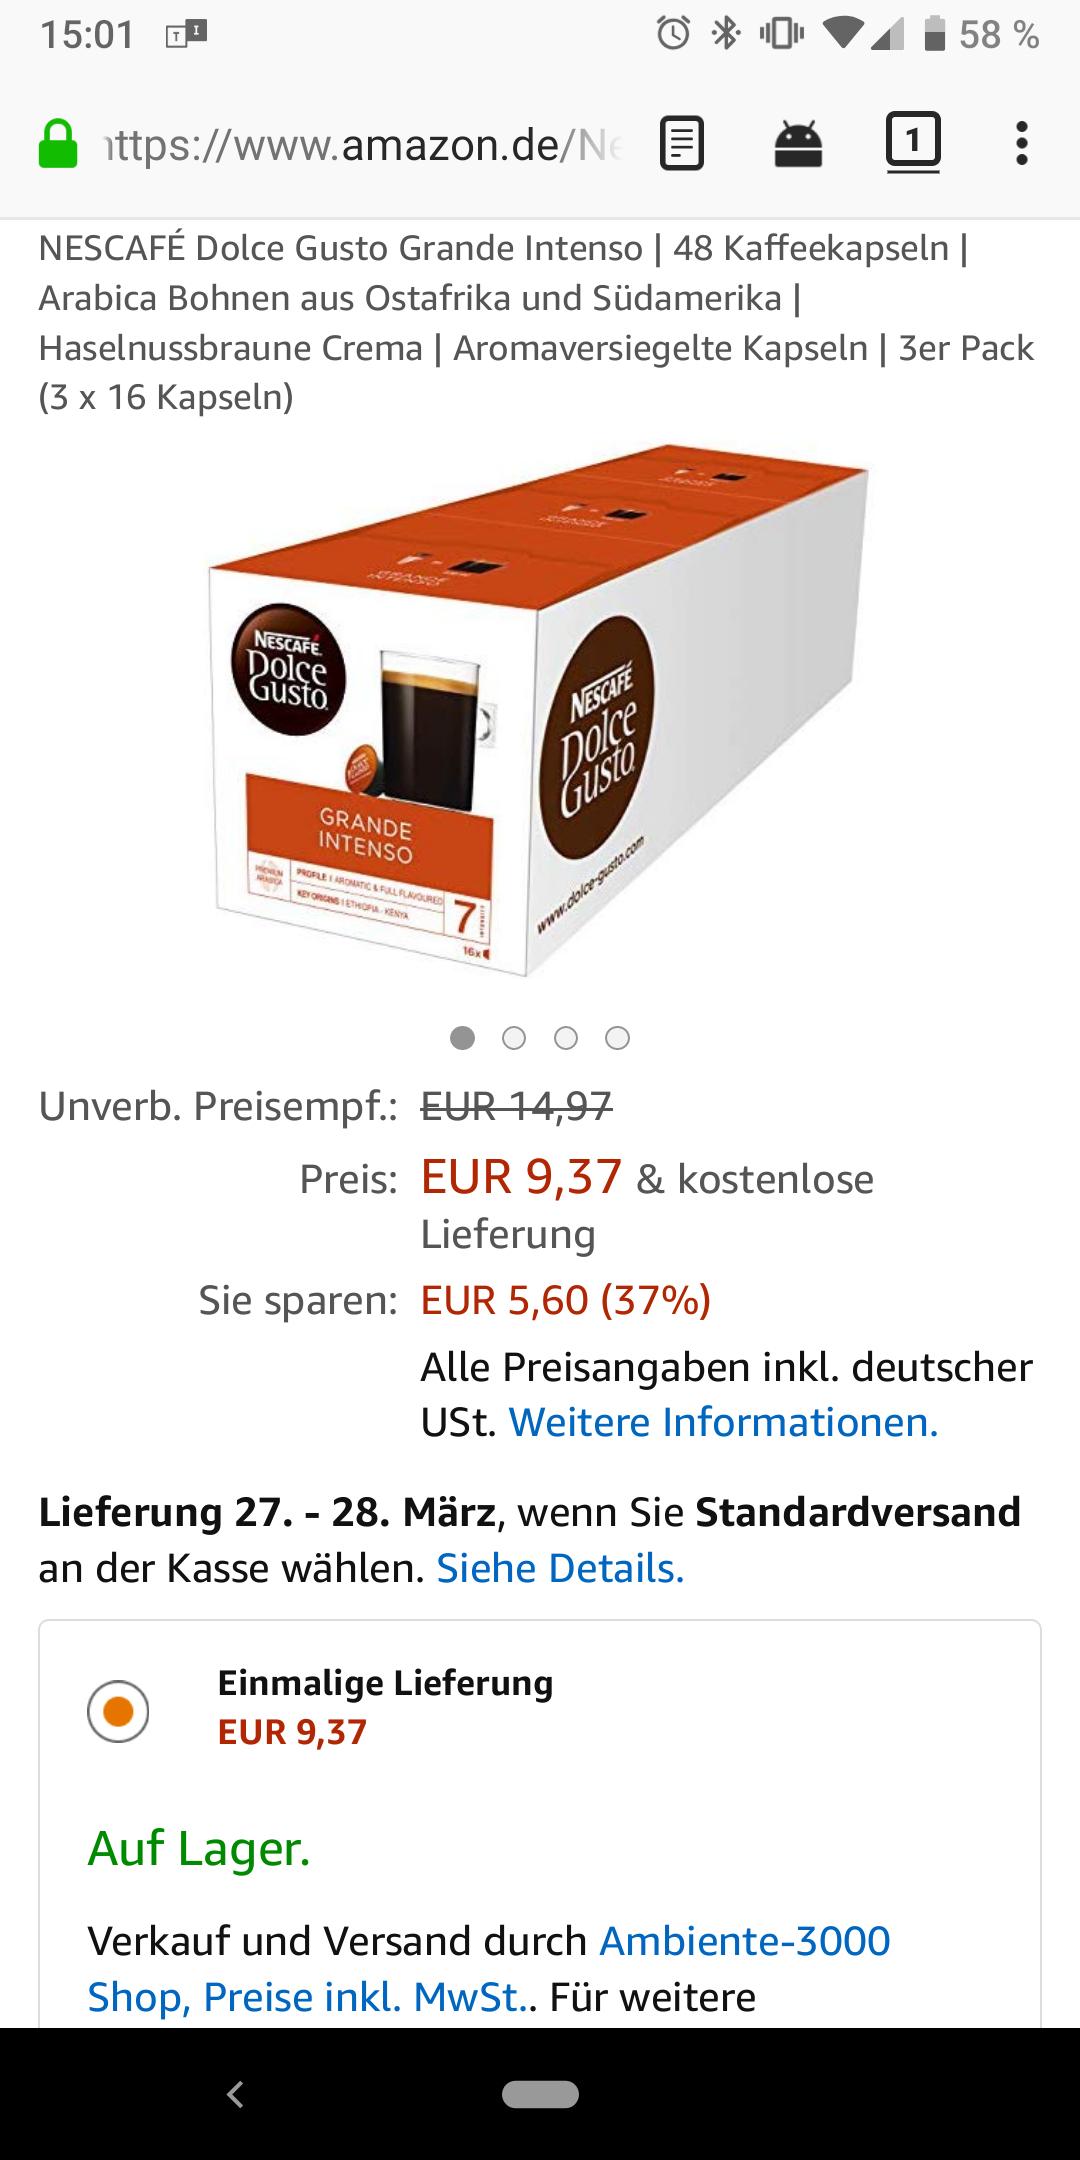 NESCAFÉ Dolce Gusto Grande Intenso | 3 x 16 Kapseln | Amazon Marketplace